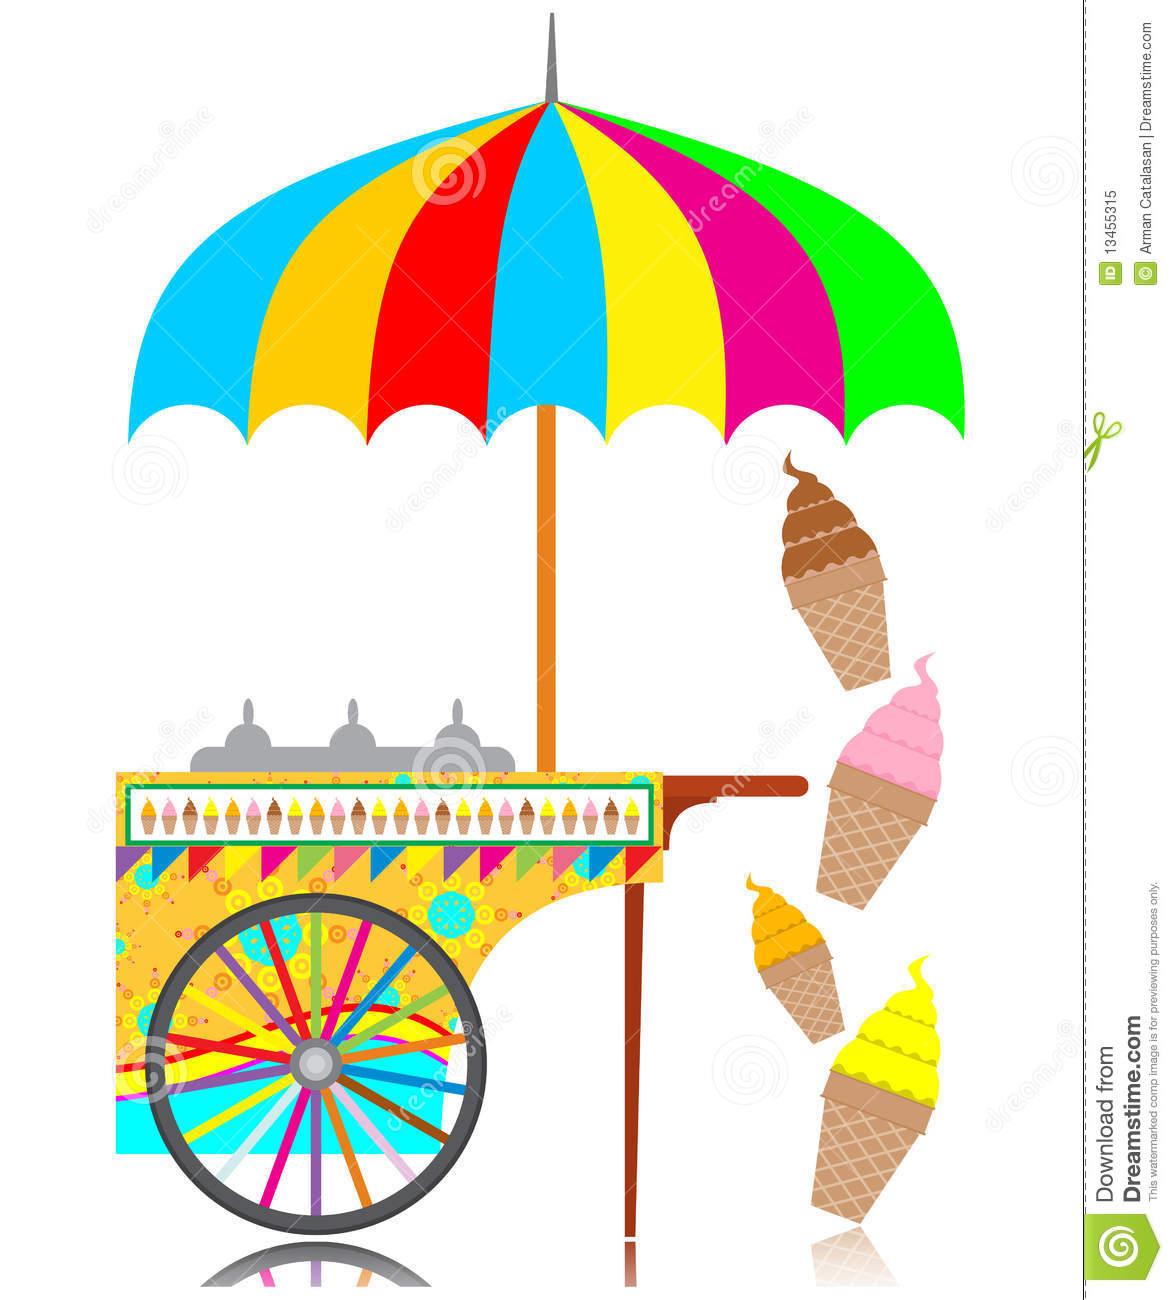 Cart clipart popsicle Die Cart Art Clip Bilder